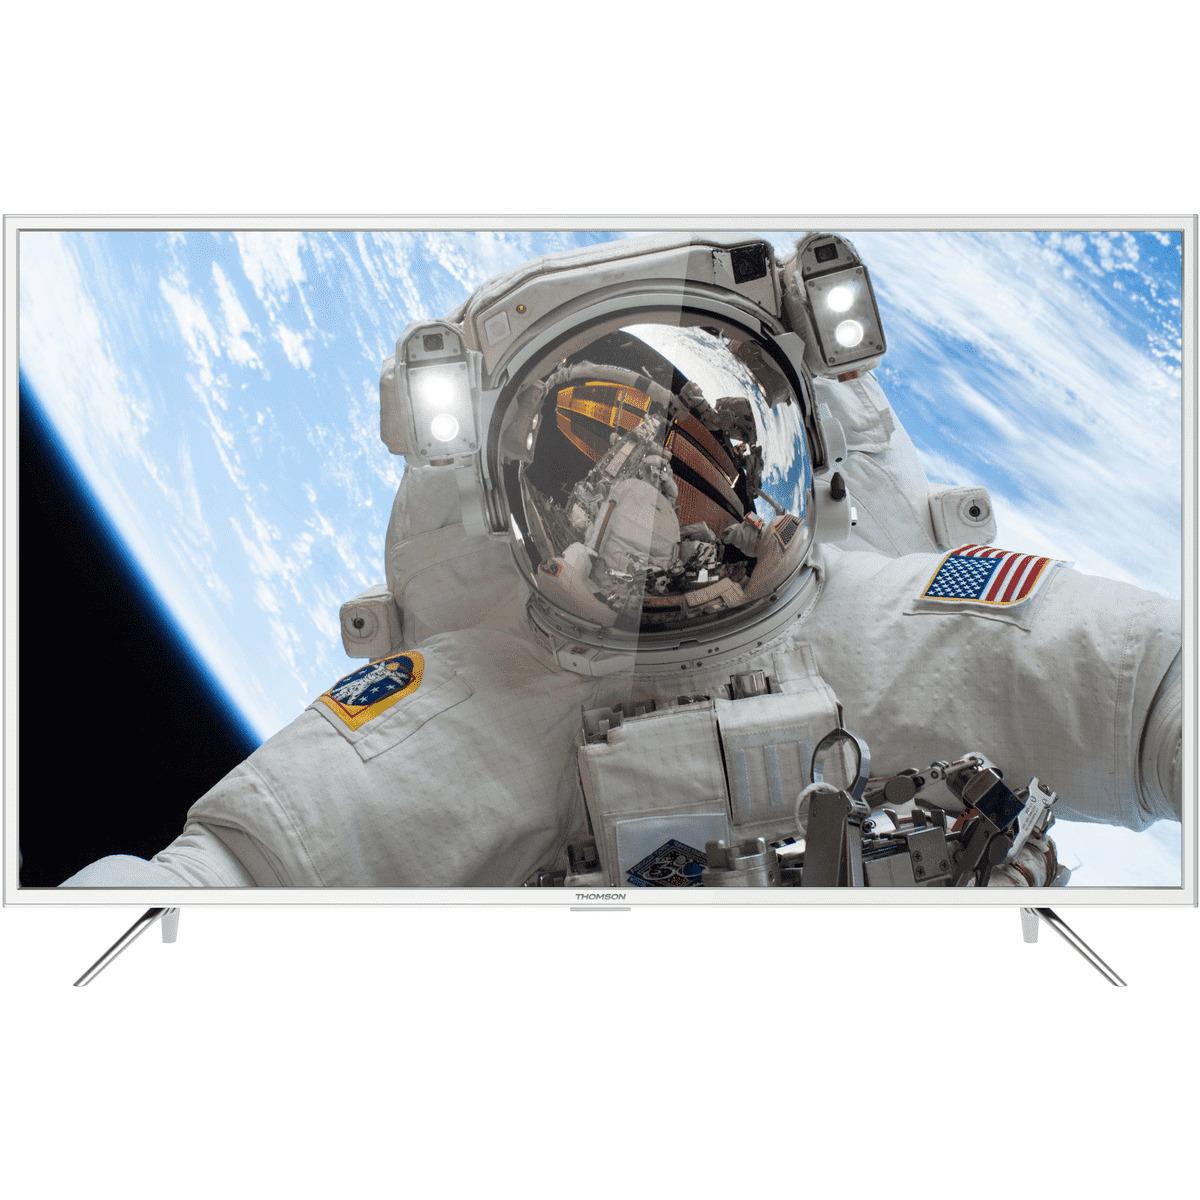 "THOMSON TV LED UHD 4K - 49""  124 cm  - 49UD6206W - Blanc"